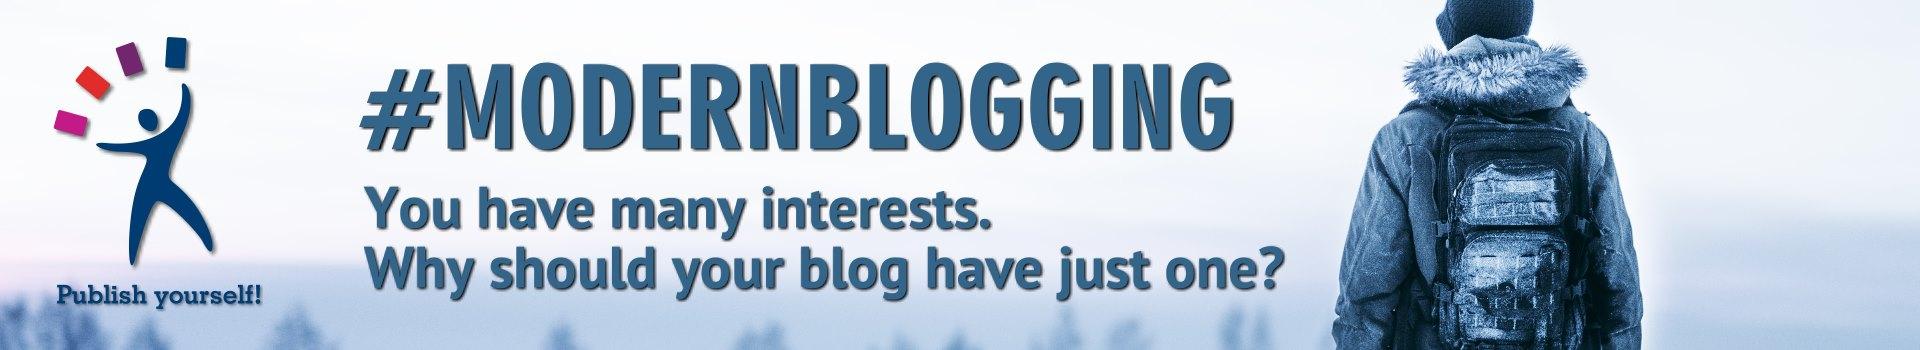 Blogging 1920x350 02a